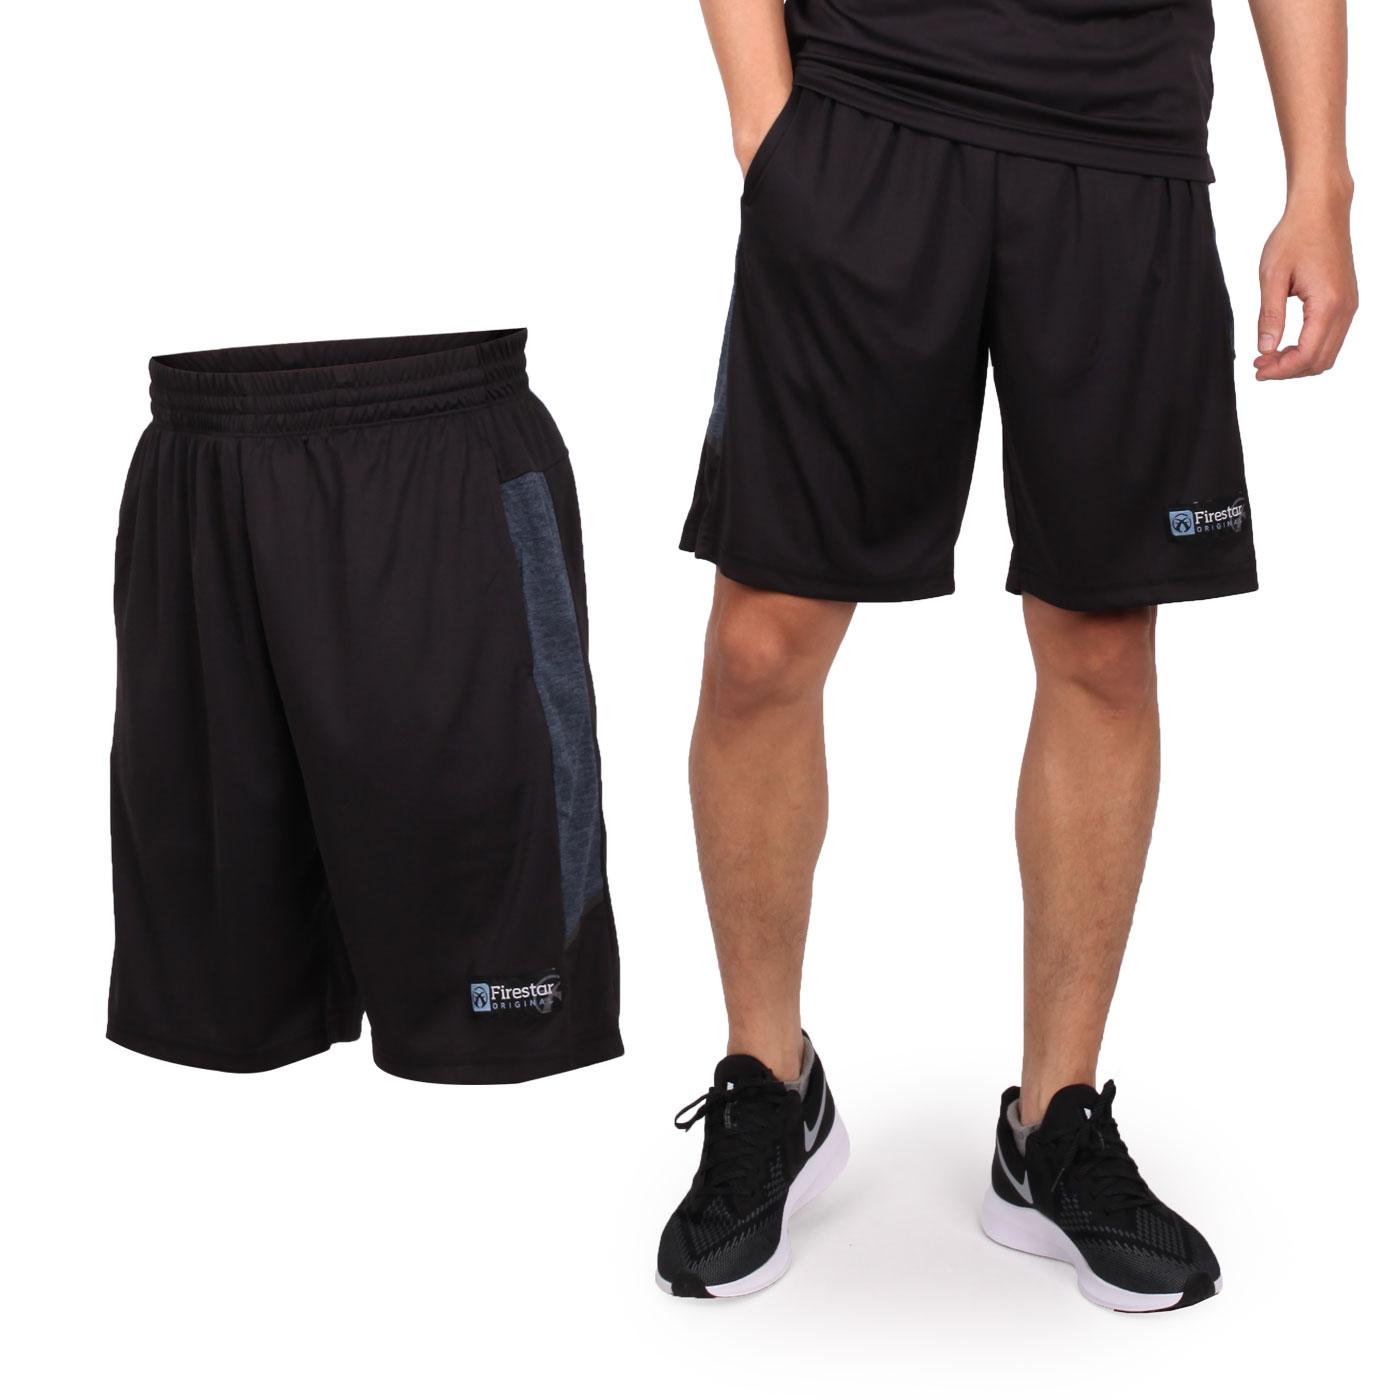 FIRESTAR 男款吸濕排汗籃球短褲 B9202-18 - 黑灰